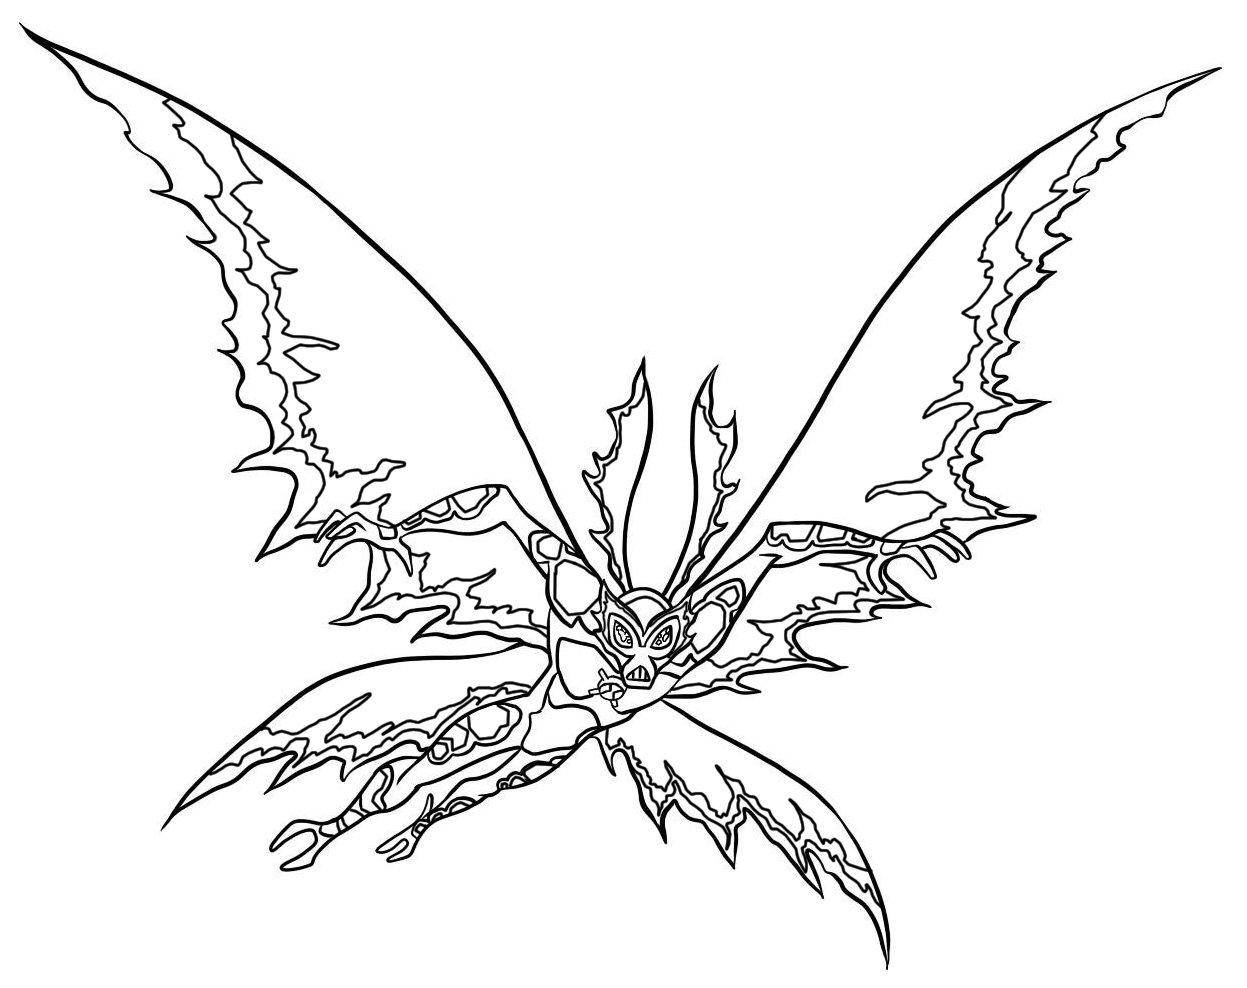 Desenho Do Ben 10 Para Colorir ~ Imagens Para Colorir